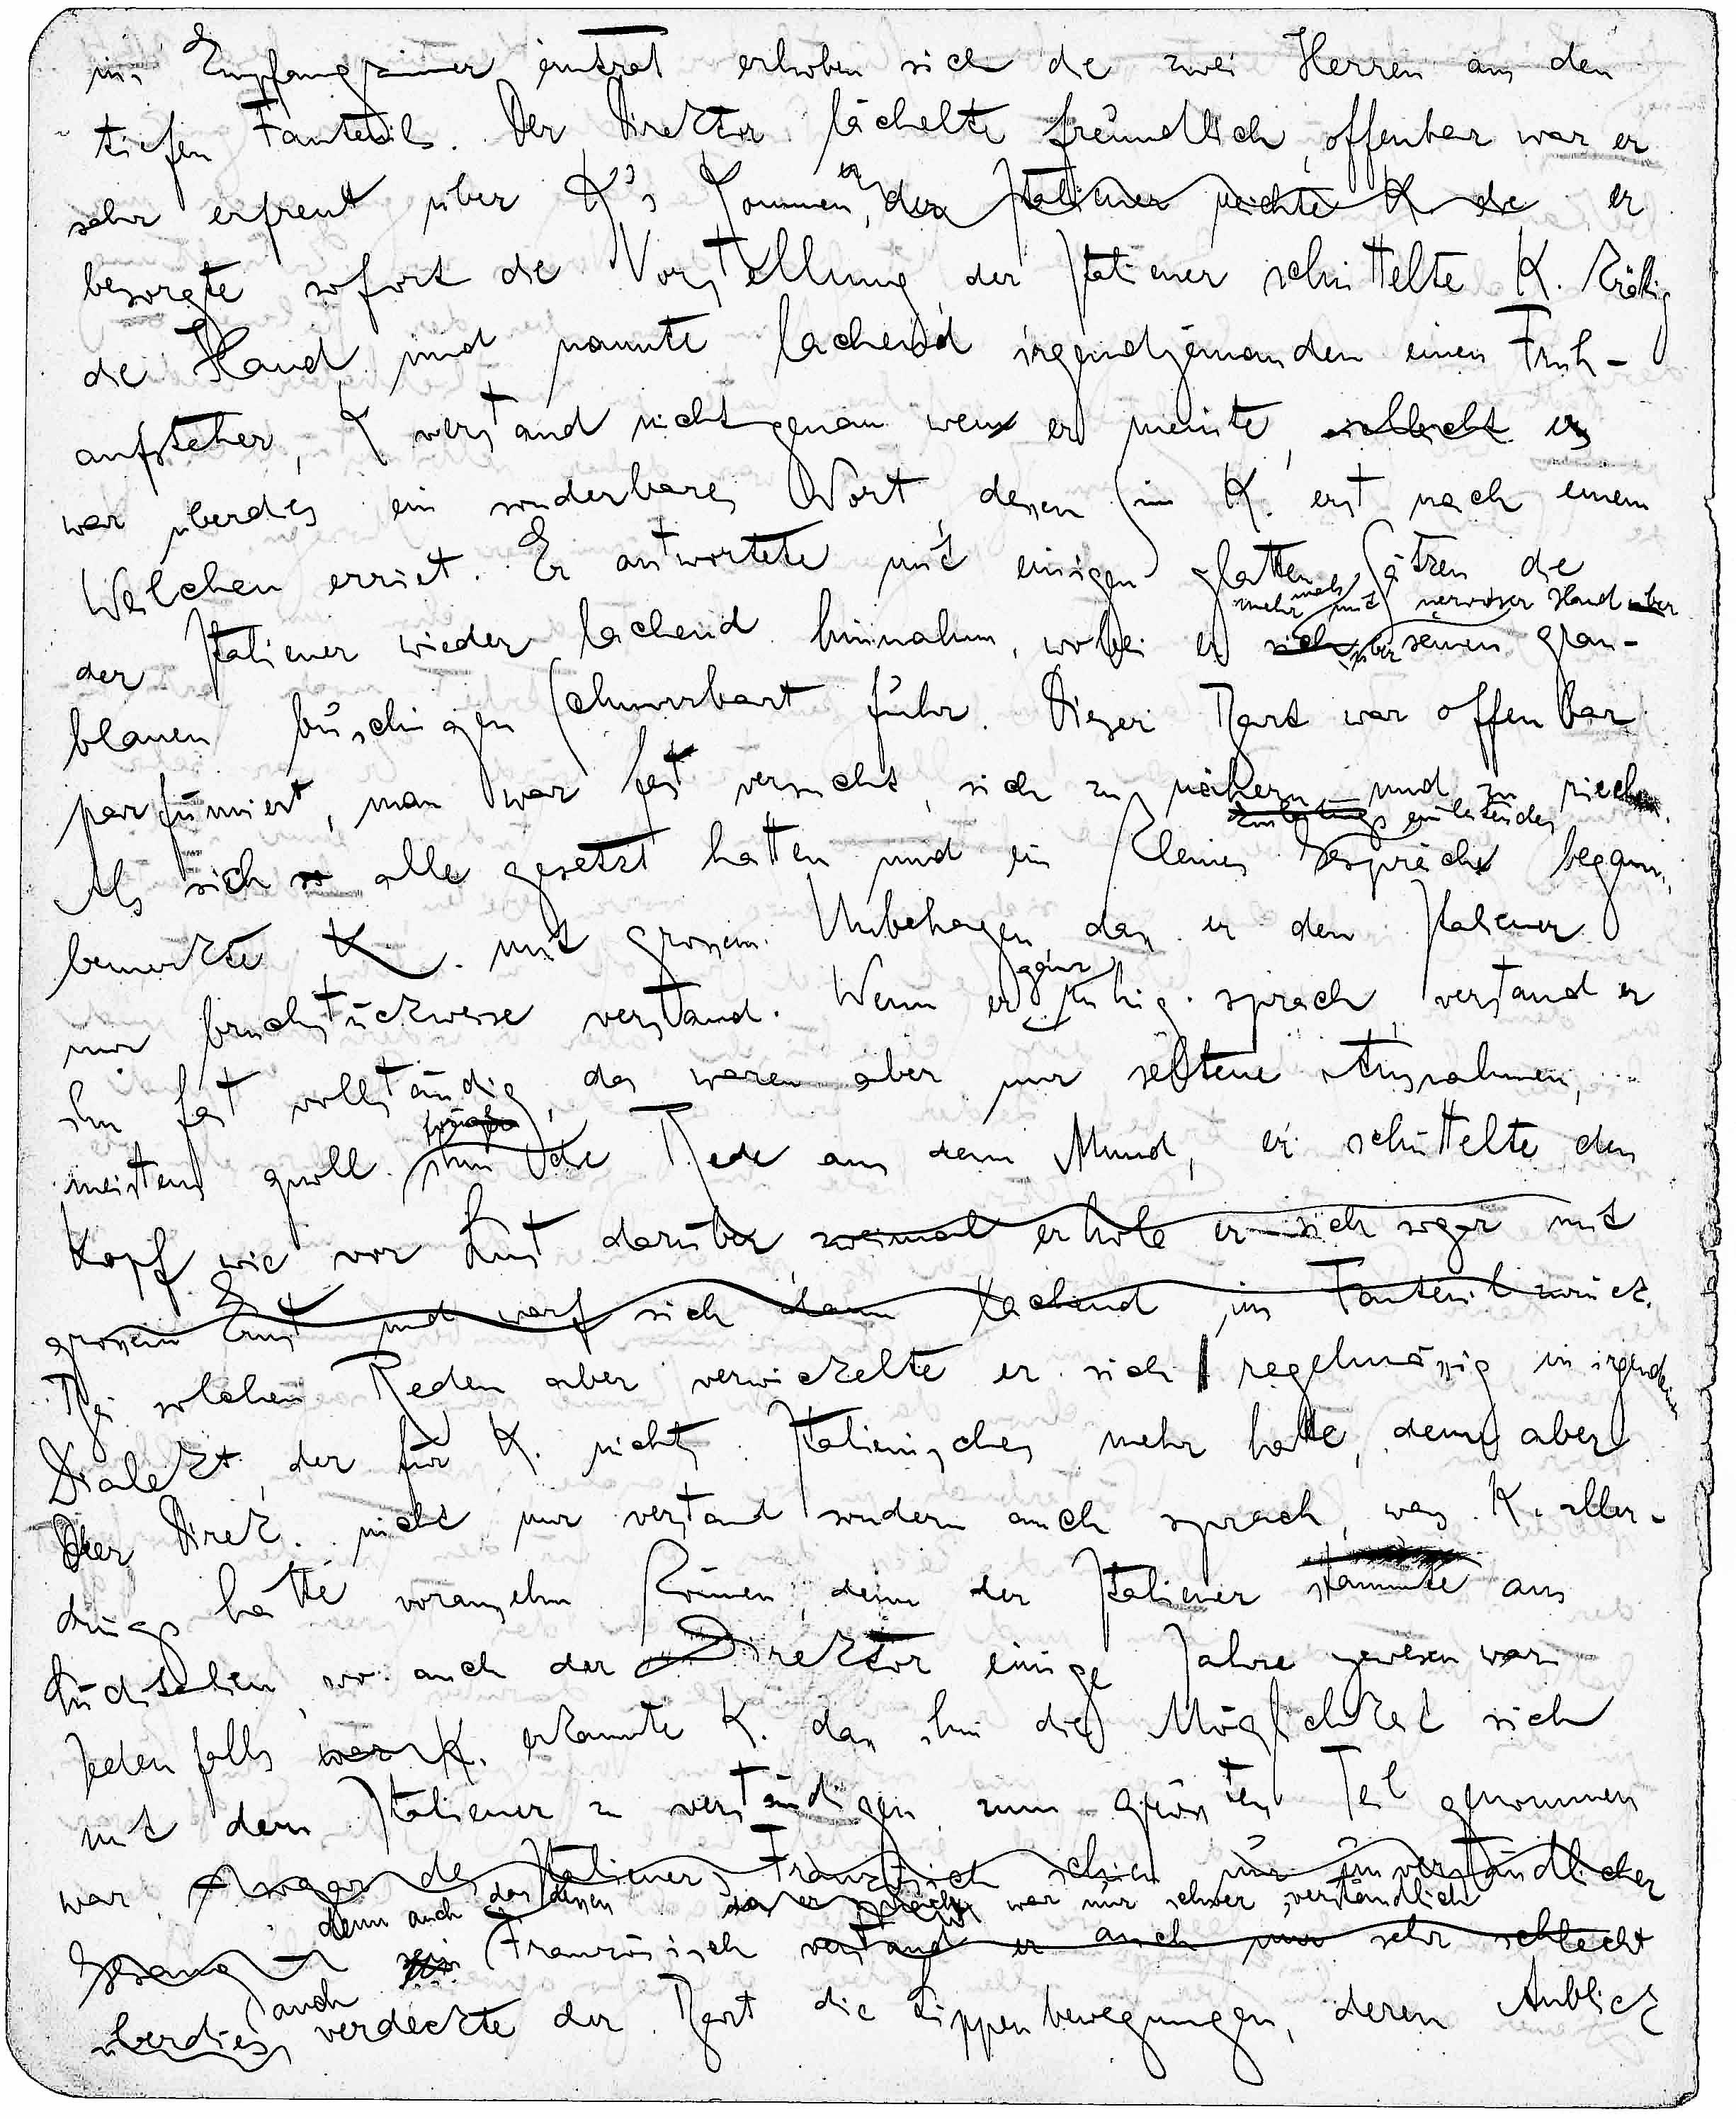 page-of-Franz-kafkas-writing-book-signed-Metamorphosis